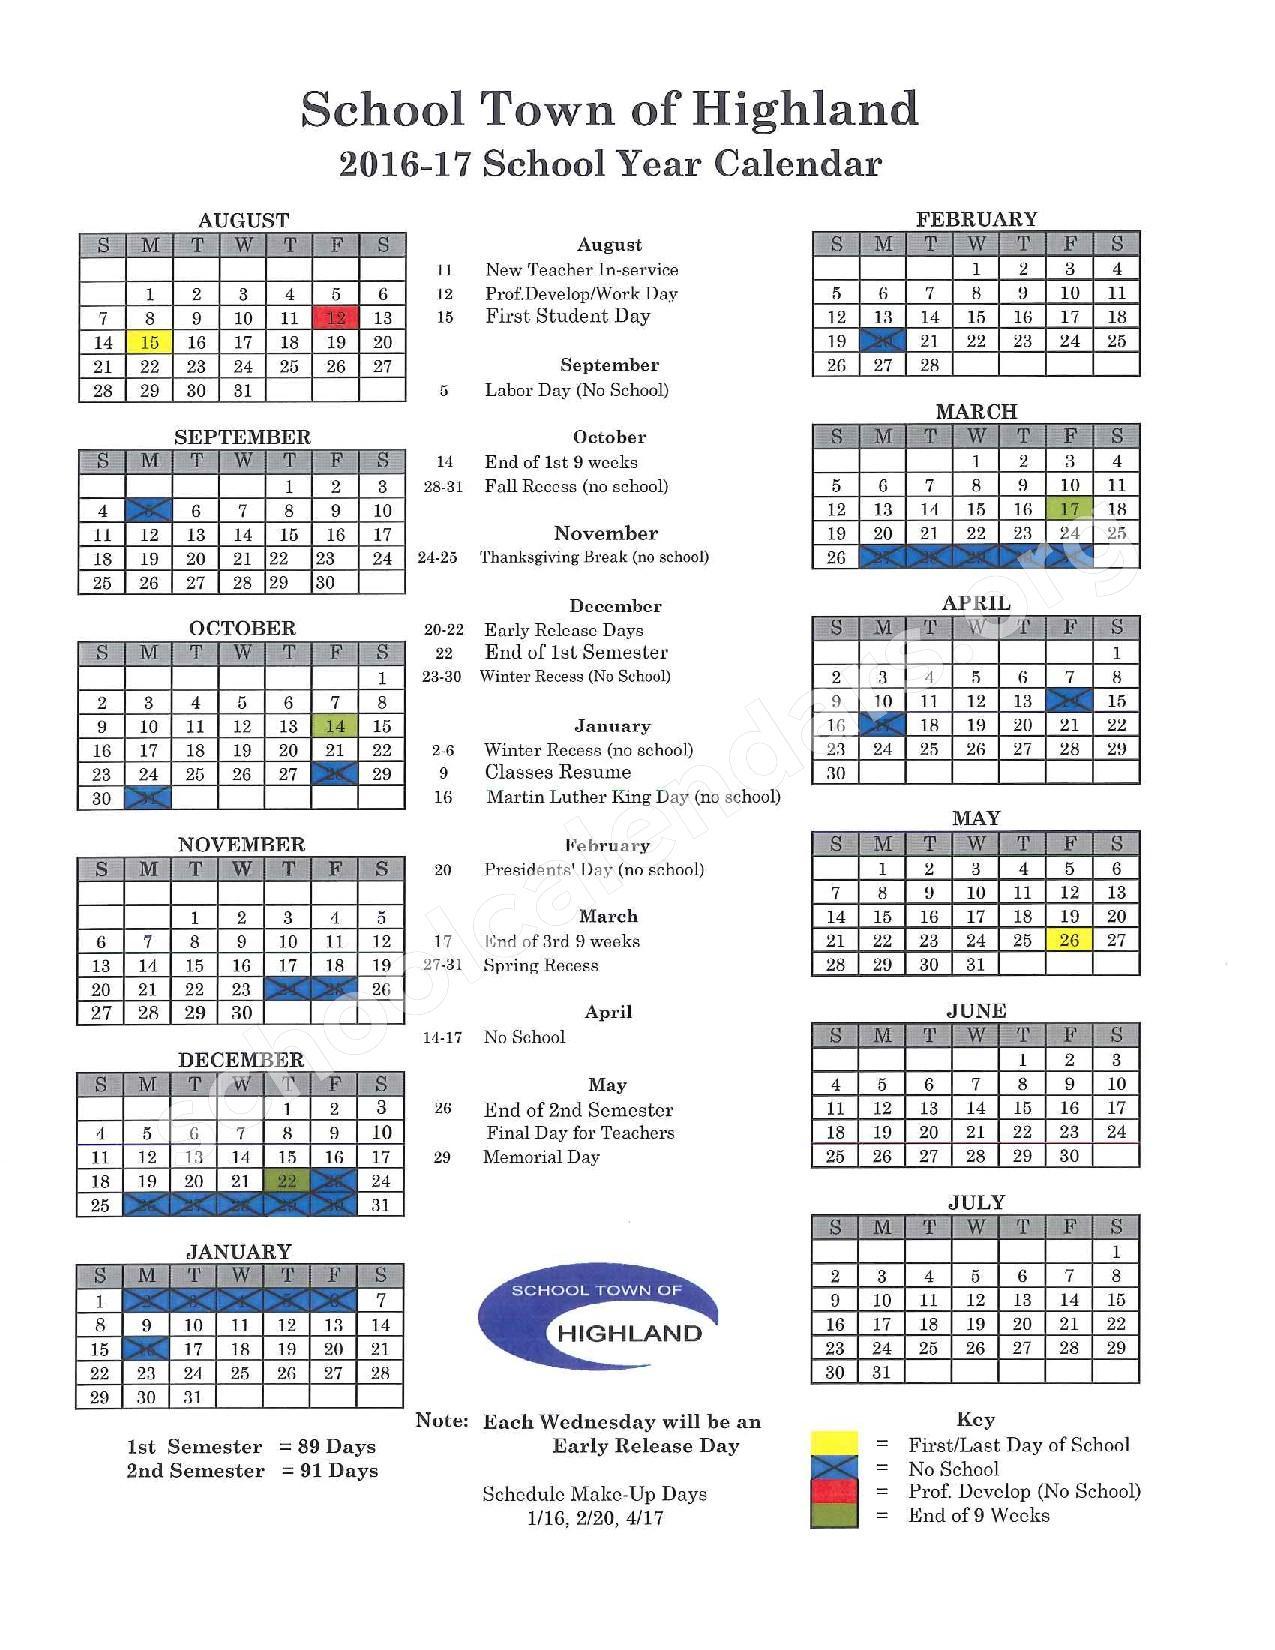 2016 - 2017 School Year Calendar – School Town of Highland – page 1